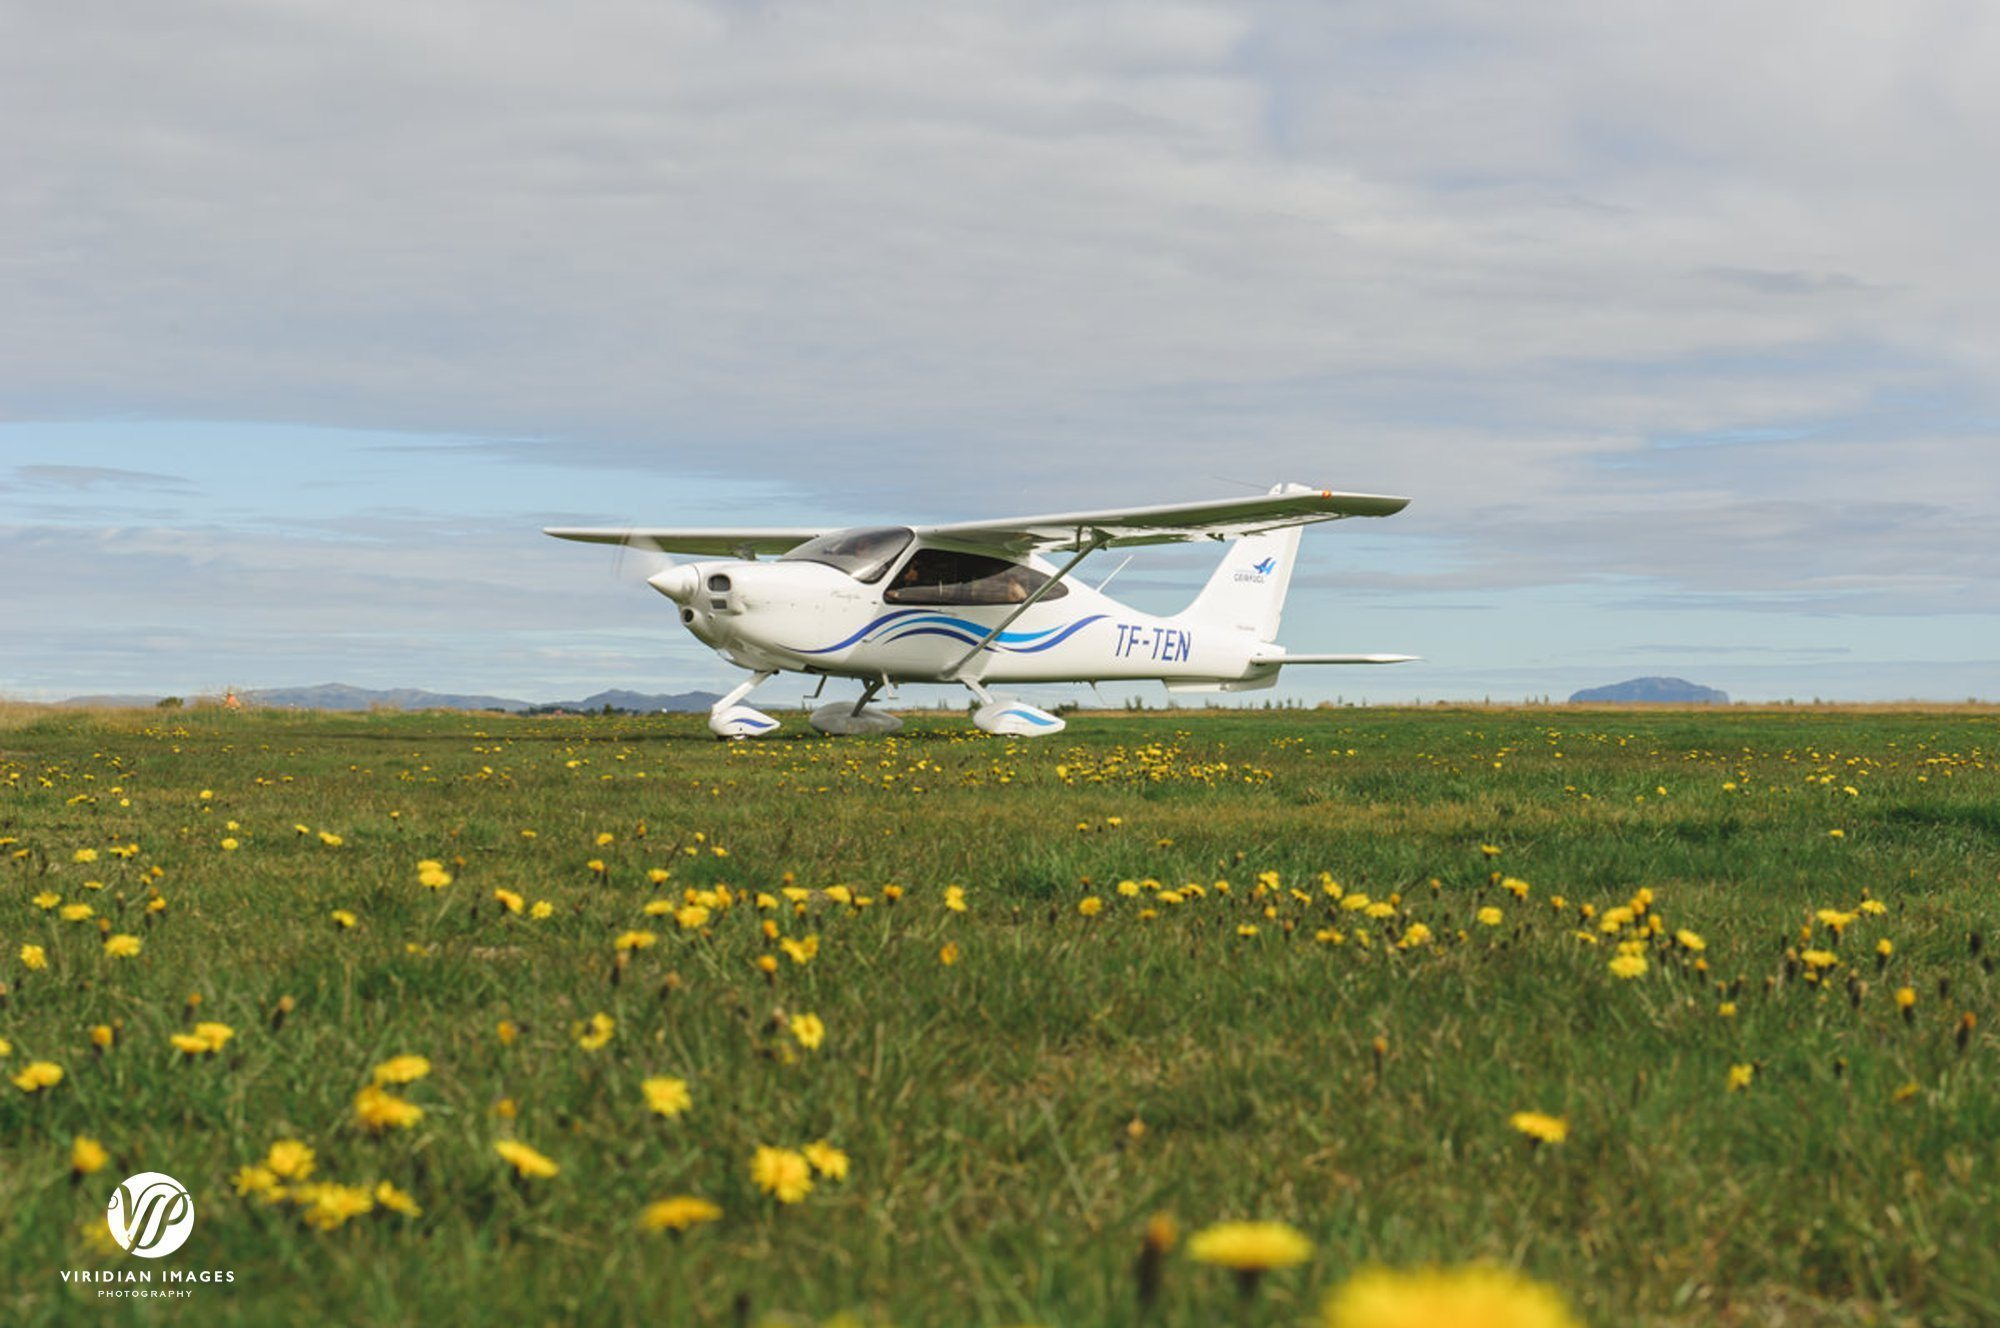 Tecnam plane approaching hella iceland